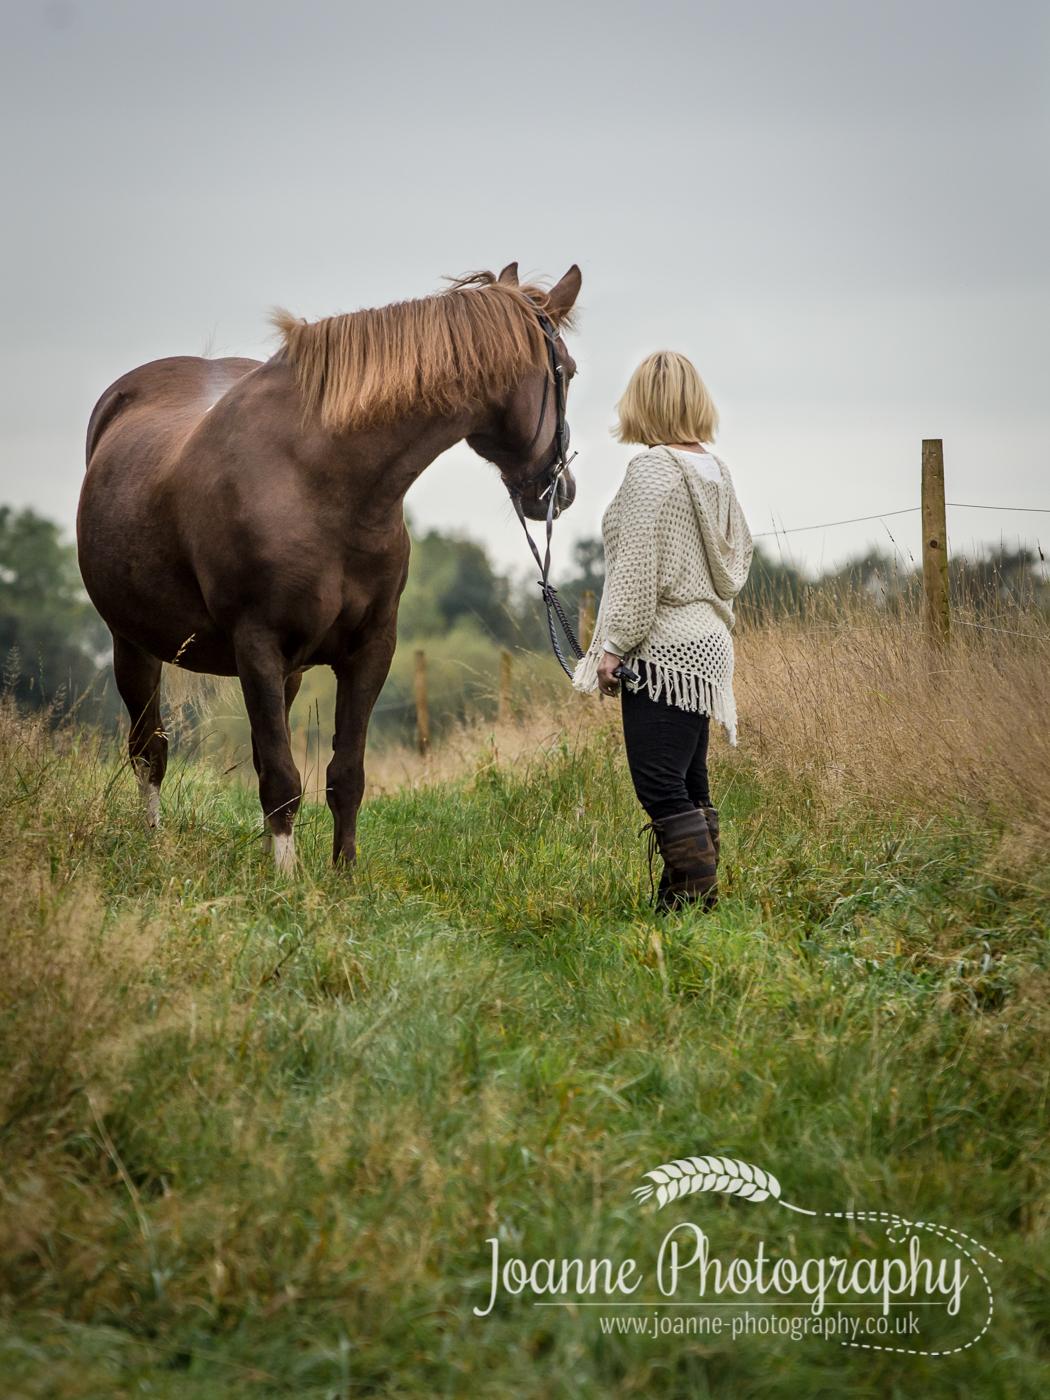 Lymm Equine Photography